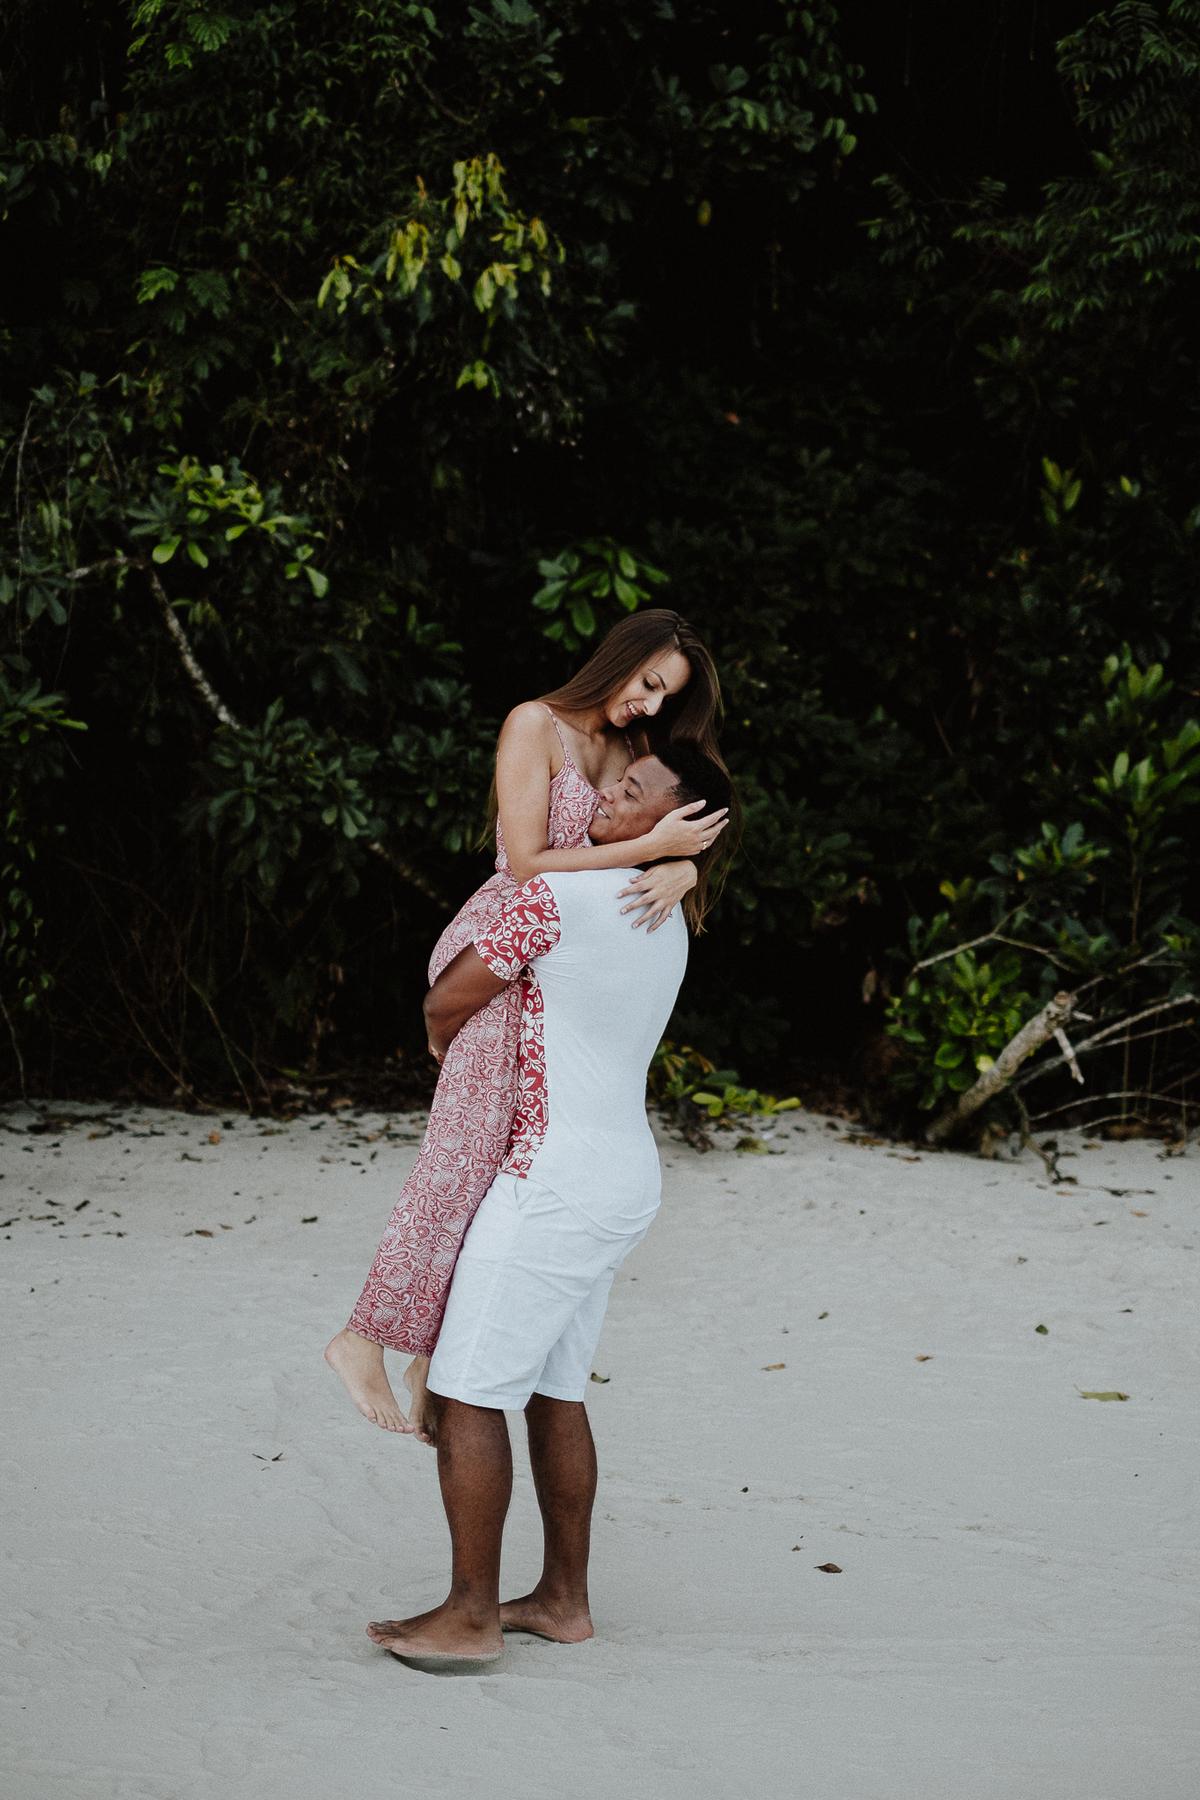 ensaio casal fotografia de casamento litoral norte praia da jureia ideias de ensaio pre wedding fotos por caio henrique ch fotografia  noivos sorrindo na praia